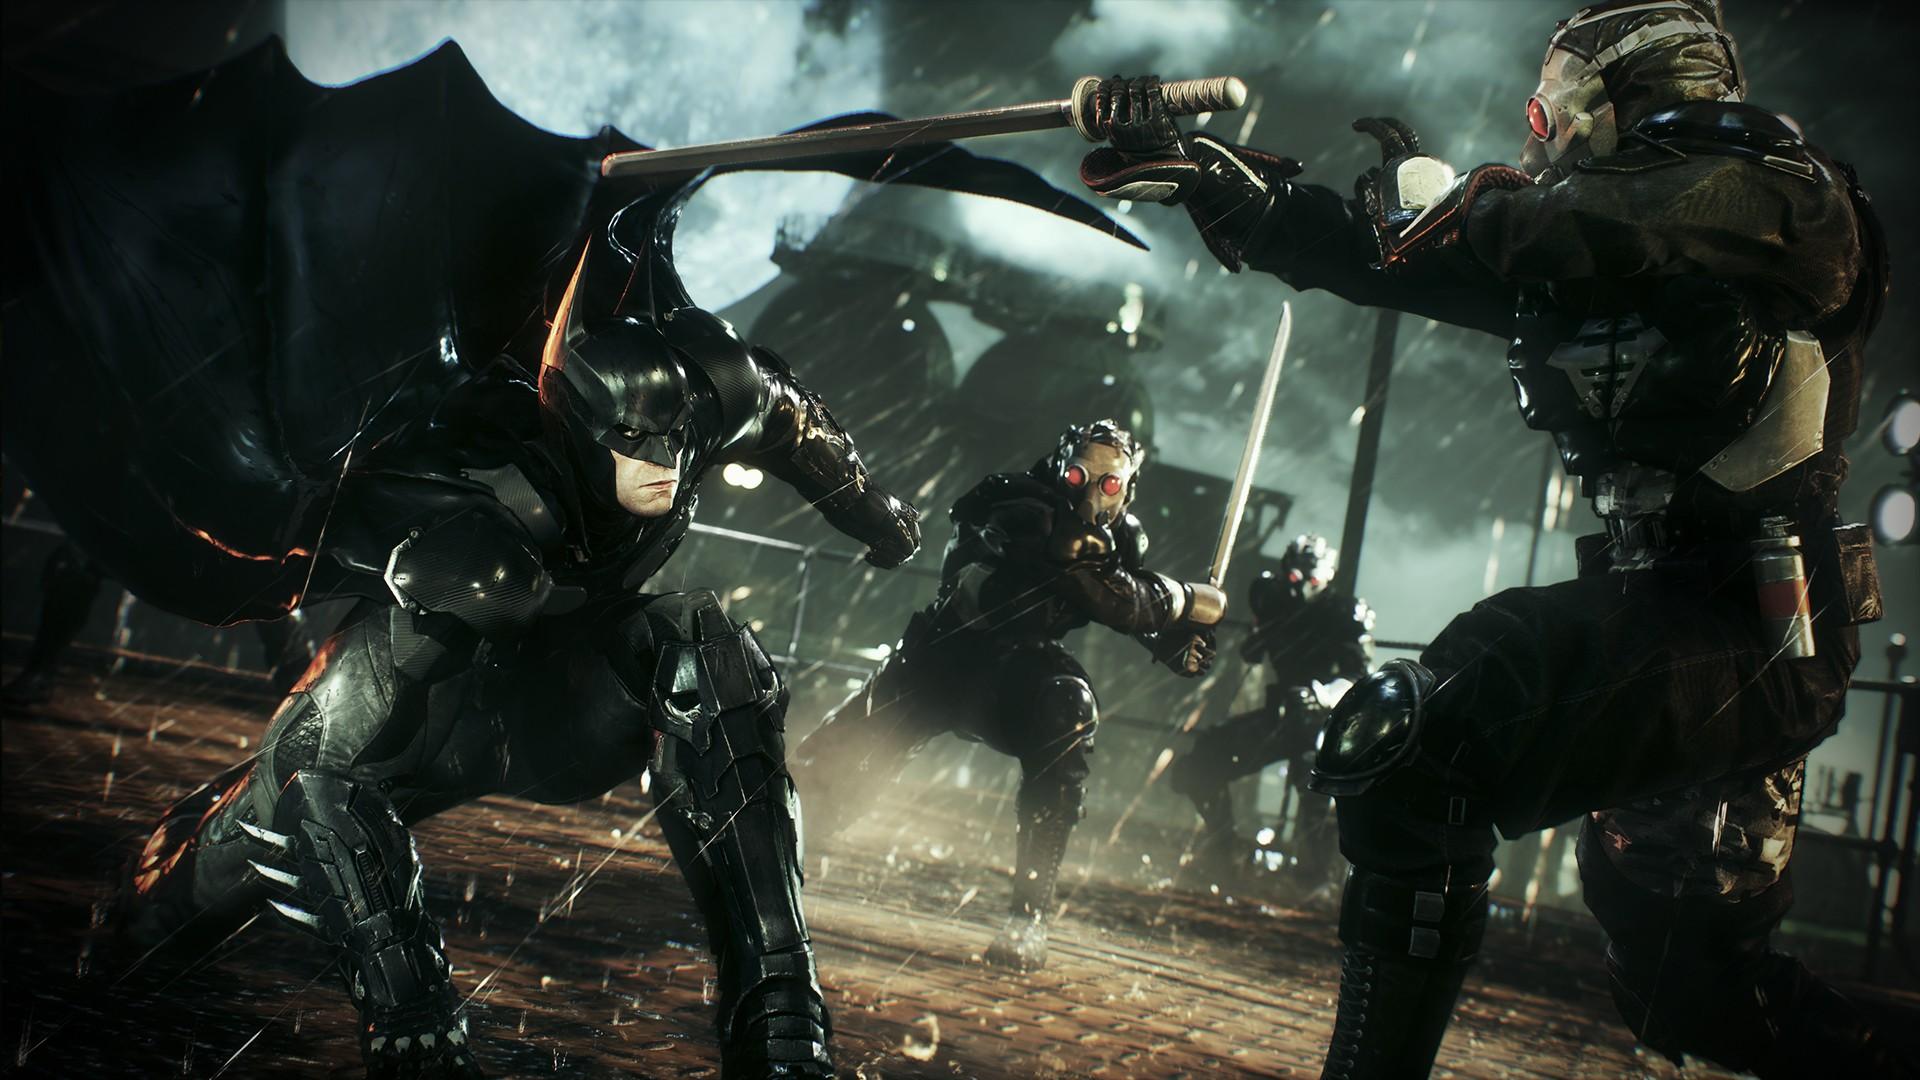 Batman: Arkham developer Rocksteady hiring for 'highly